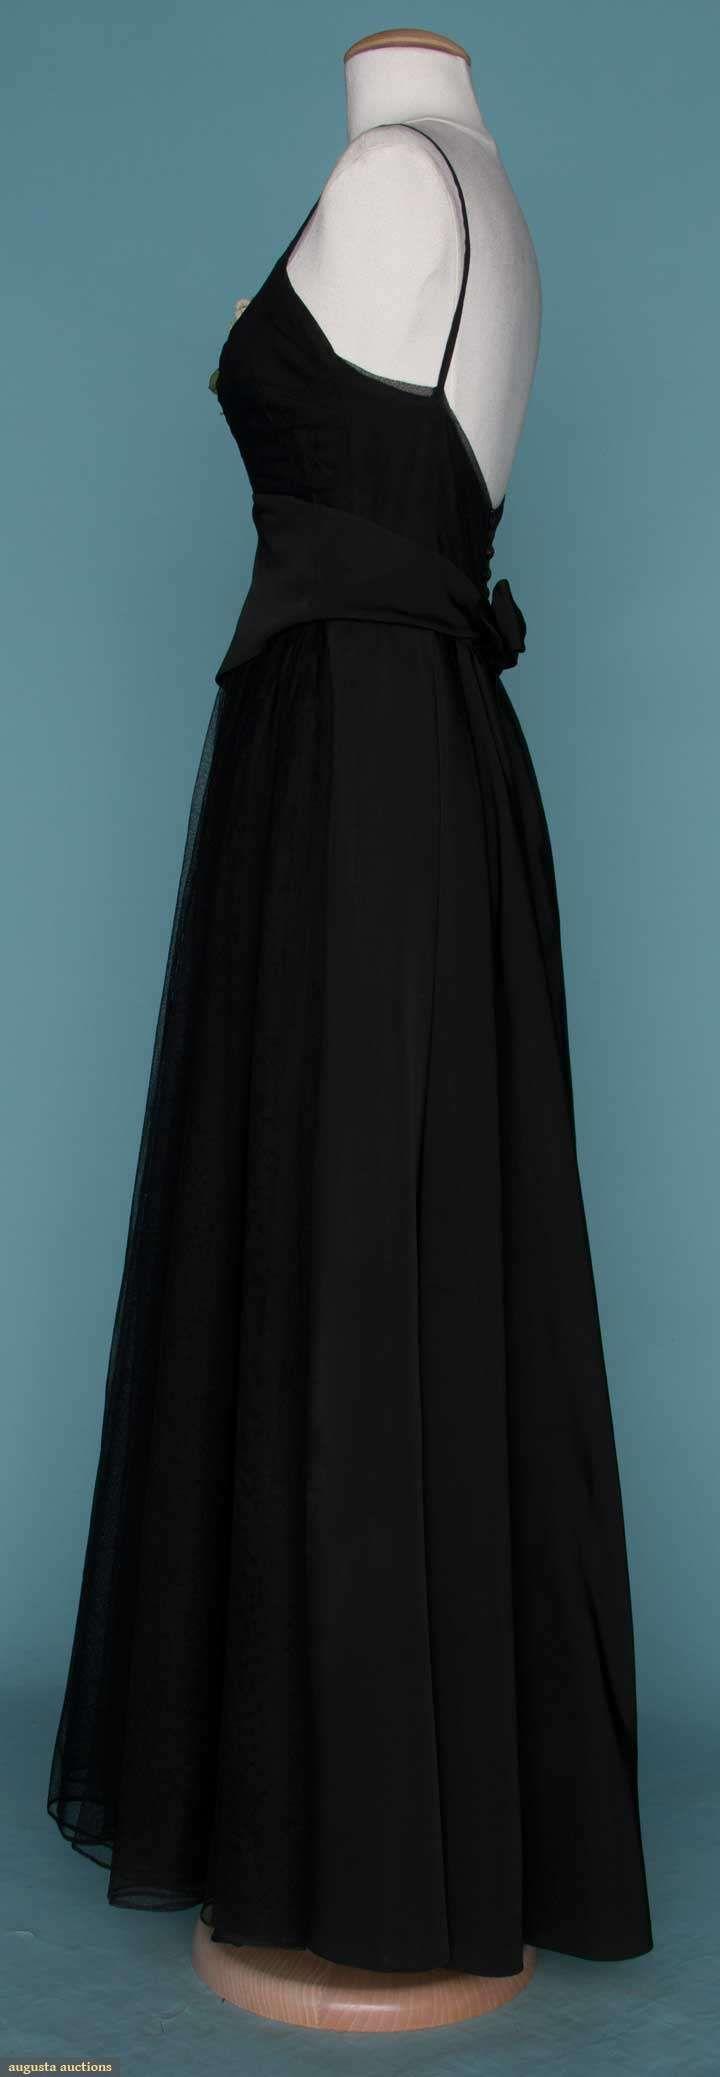 Black silk twill u net ball gown ca early s mainbocher